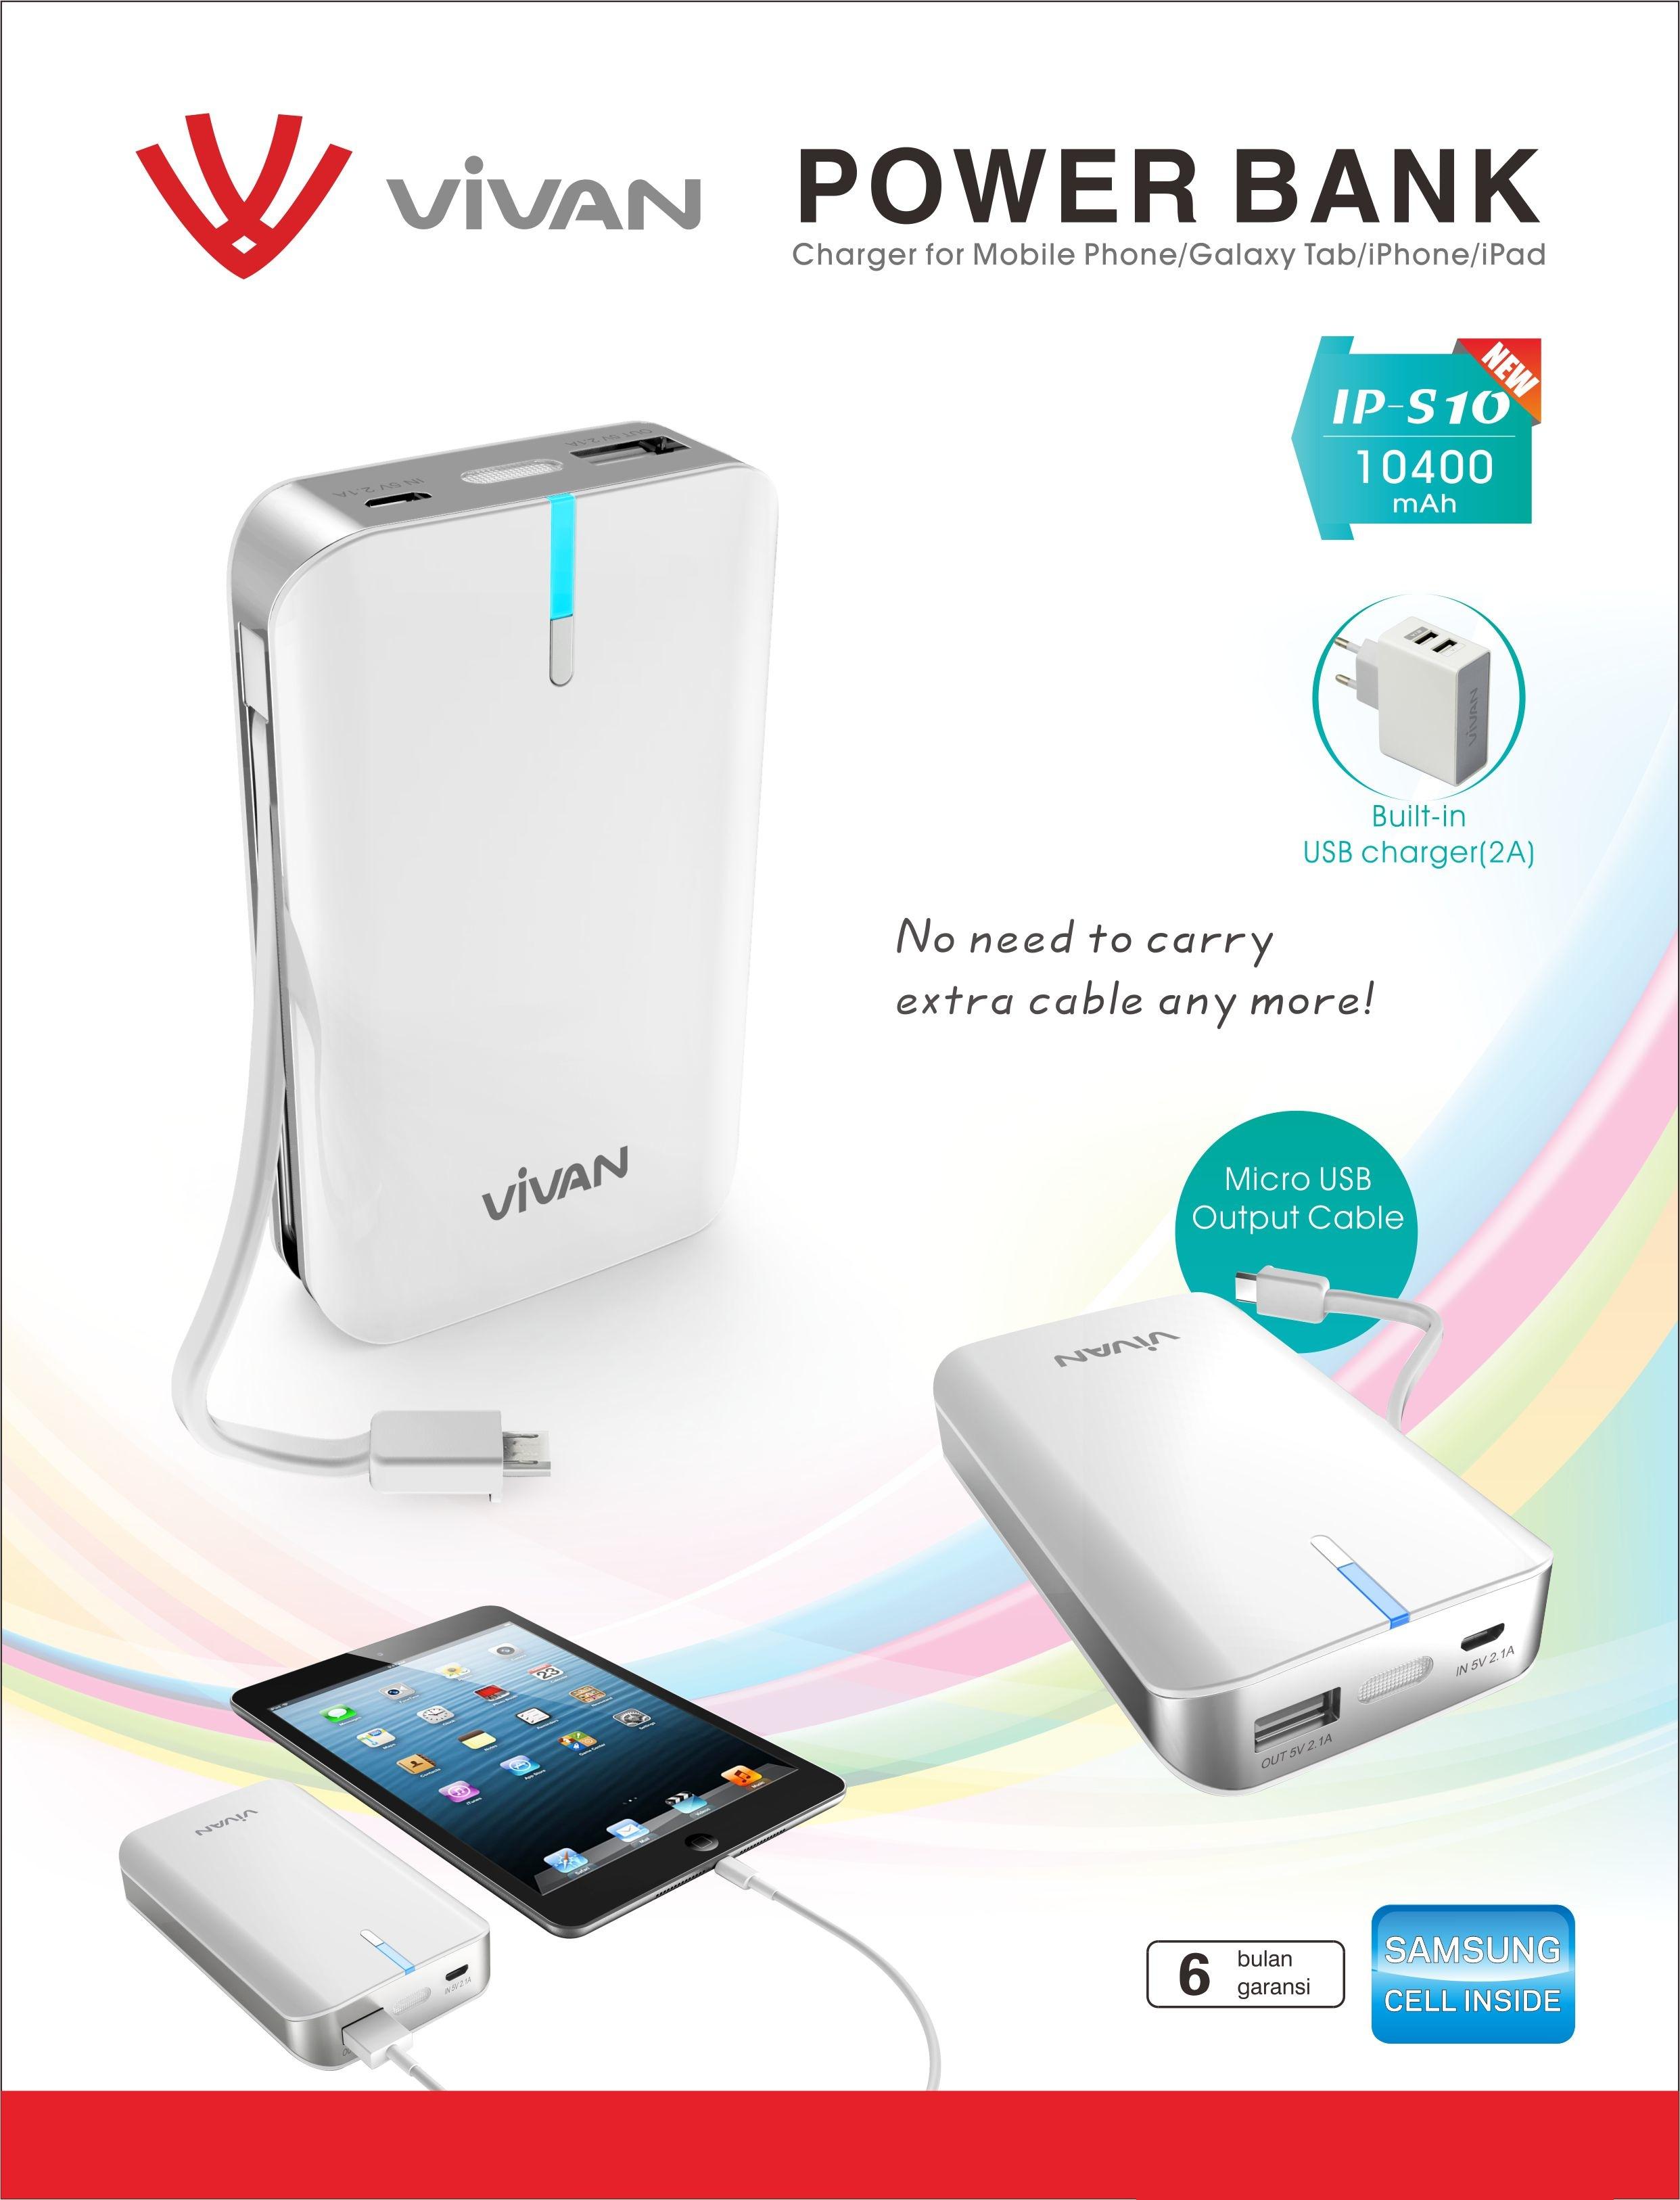 Vivan Powerbank Ips10 10400mah Dual Output Built In Cable Kabel Power Bank Nempel